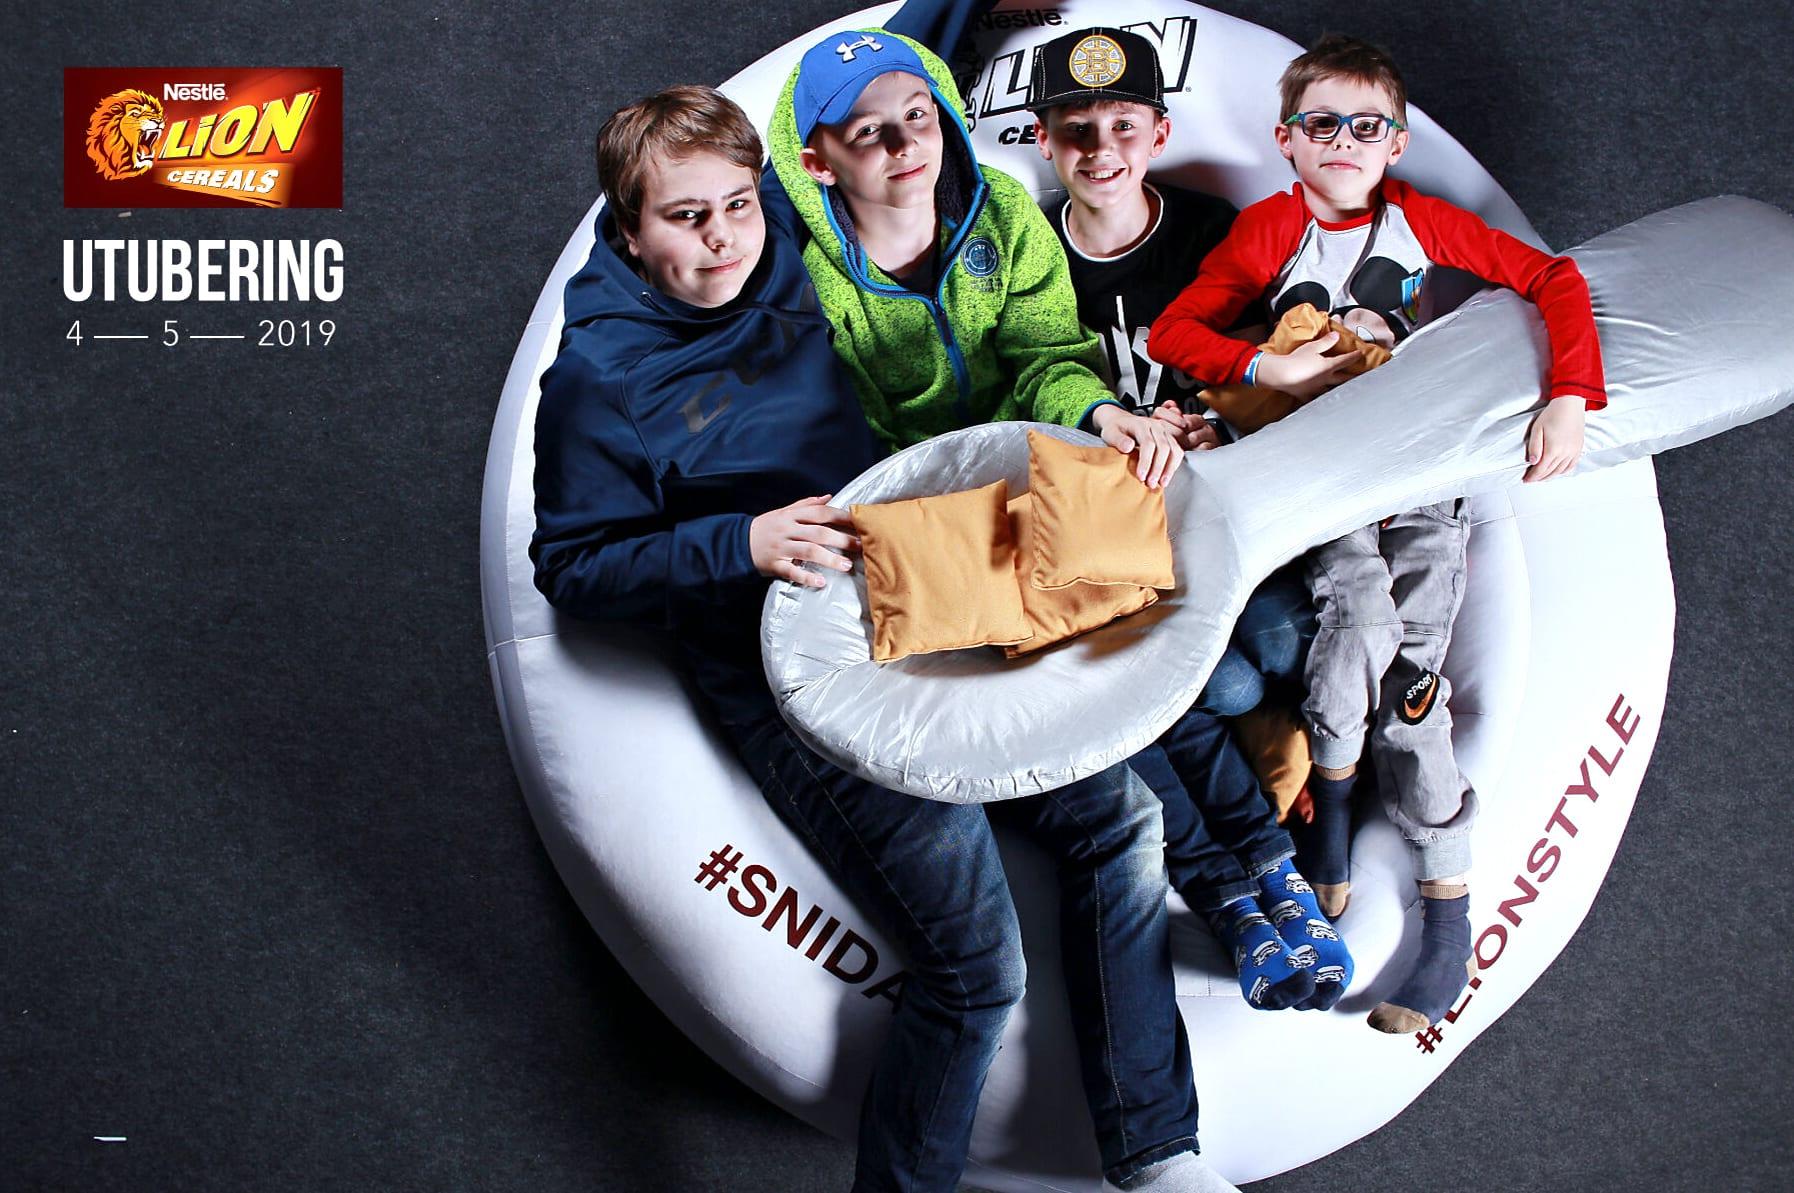 fotokoutek-brno-festival-lion-cereals-utubering-brno-4-5-2019-602507